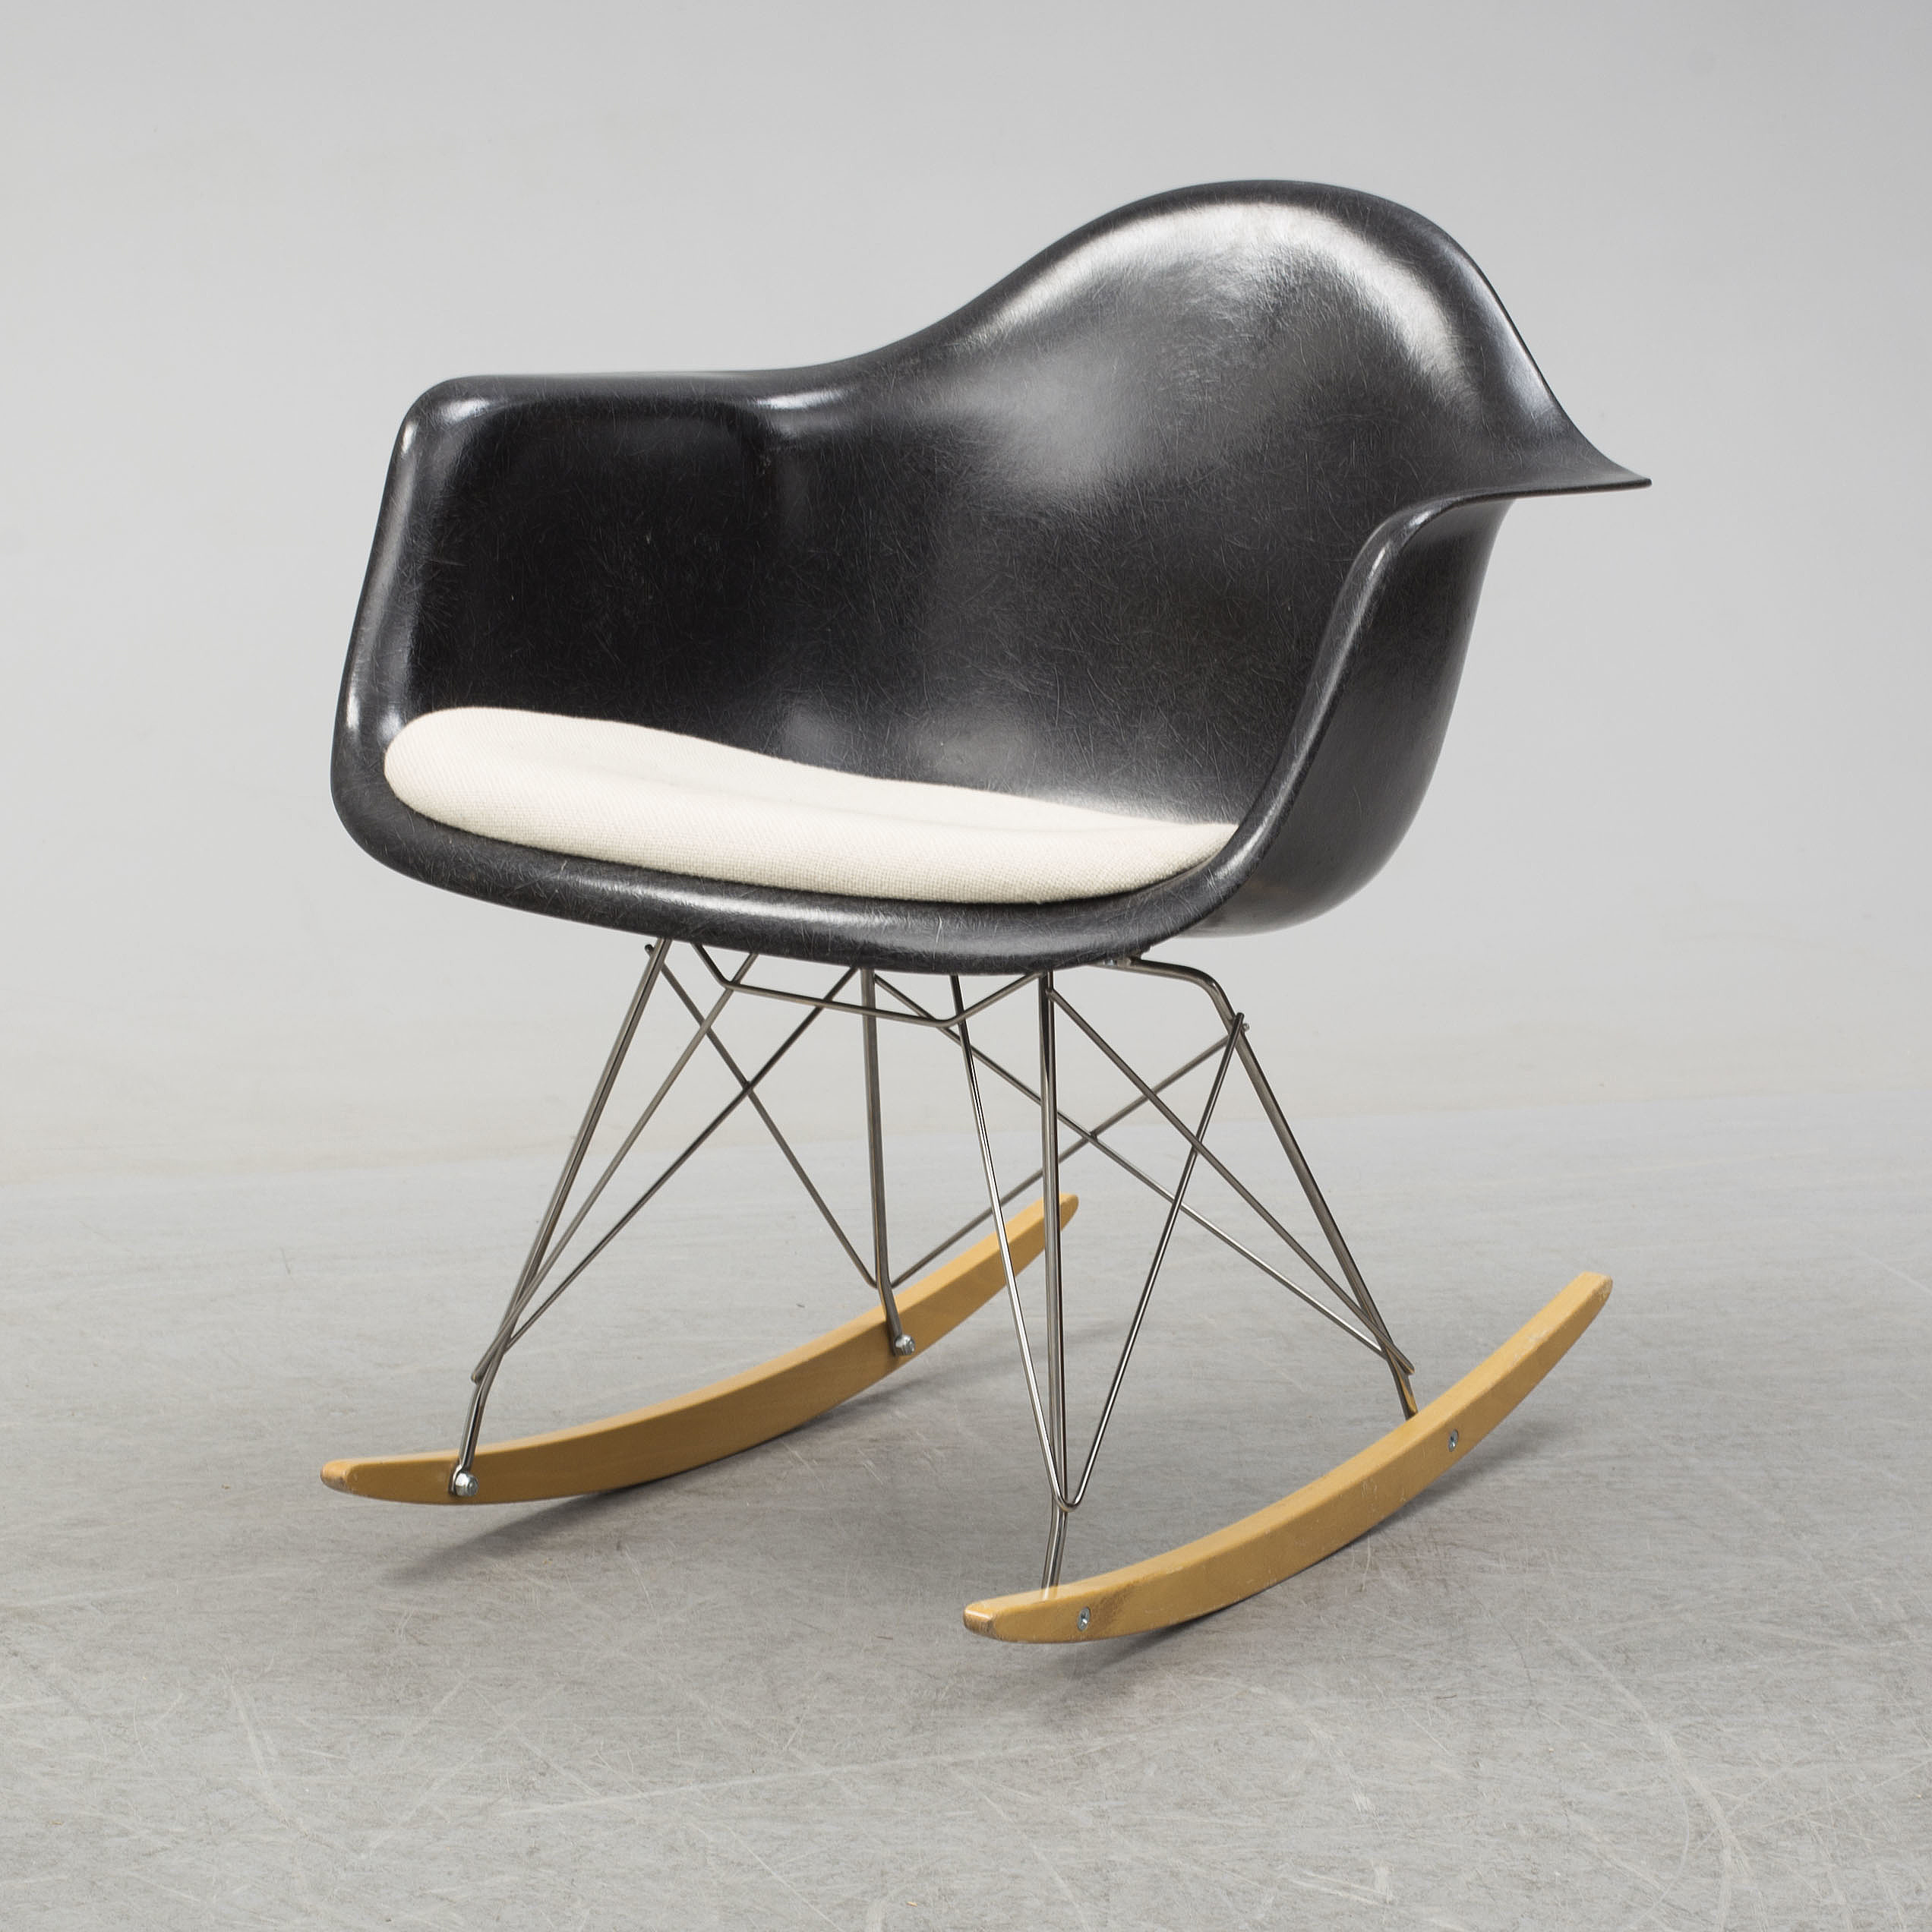 A U0027Rocket Chairu0027 By Charles U0026 Ray Eames, Herman Miller, Late 20th Century.    Bukowskis